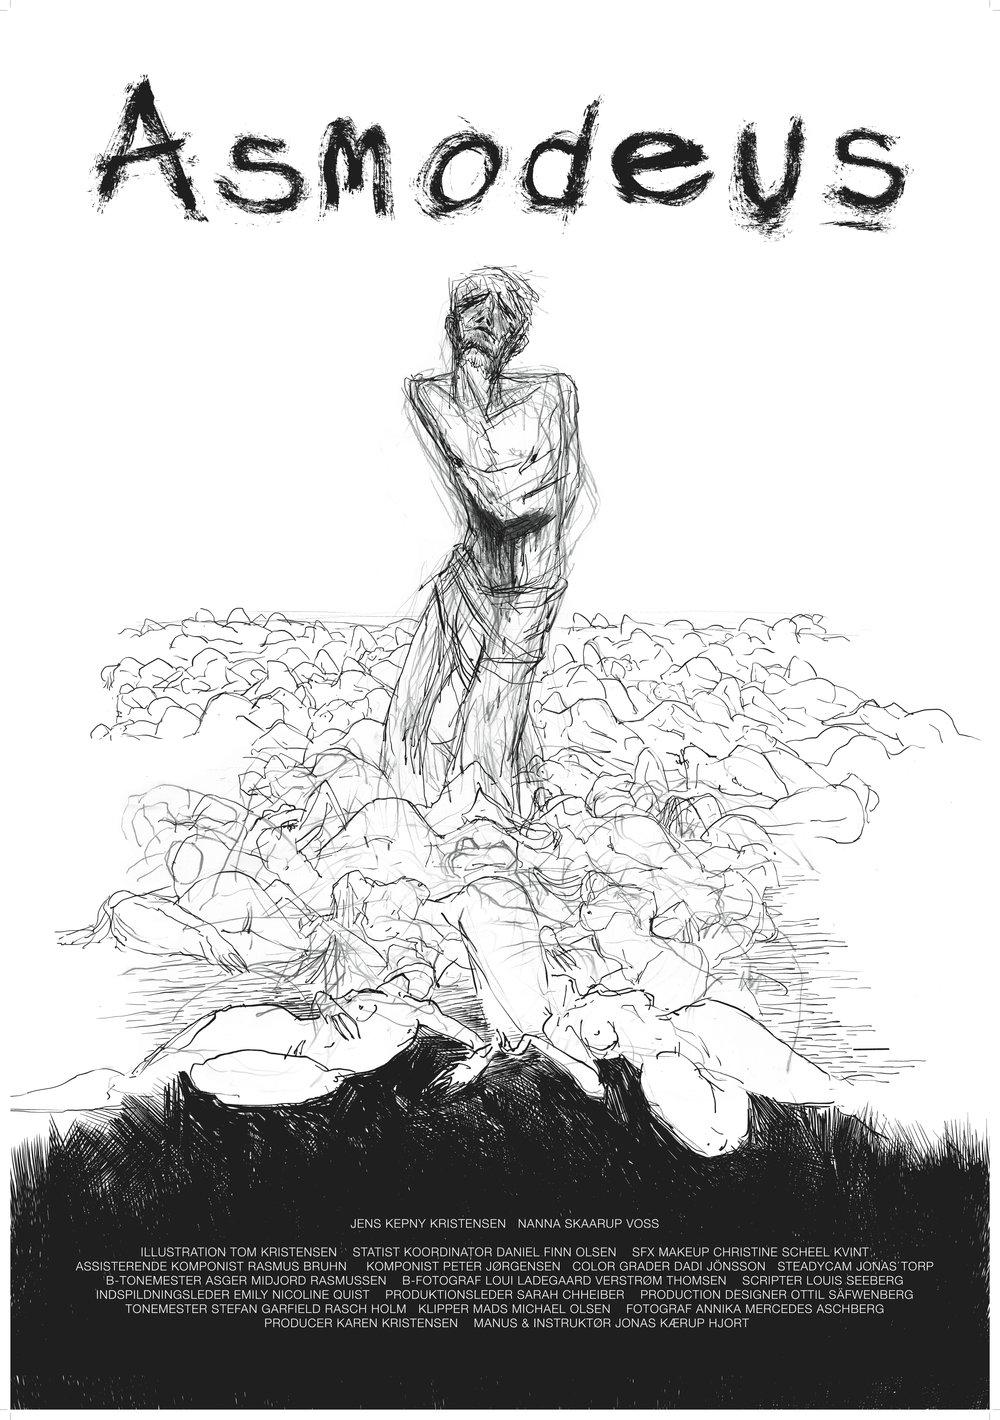 Asmodeus (dir. Jonas Hjort, 50min feature)